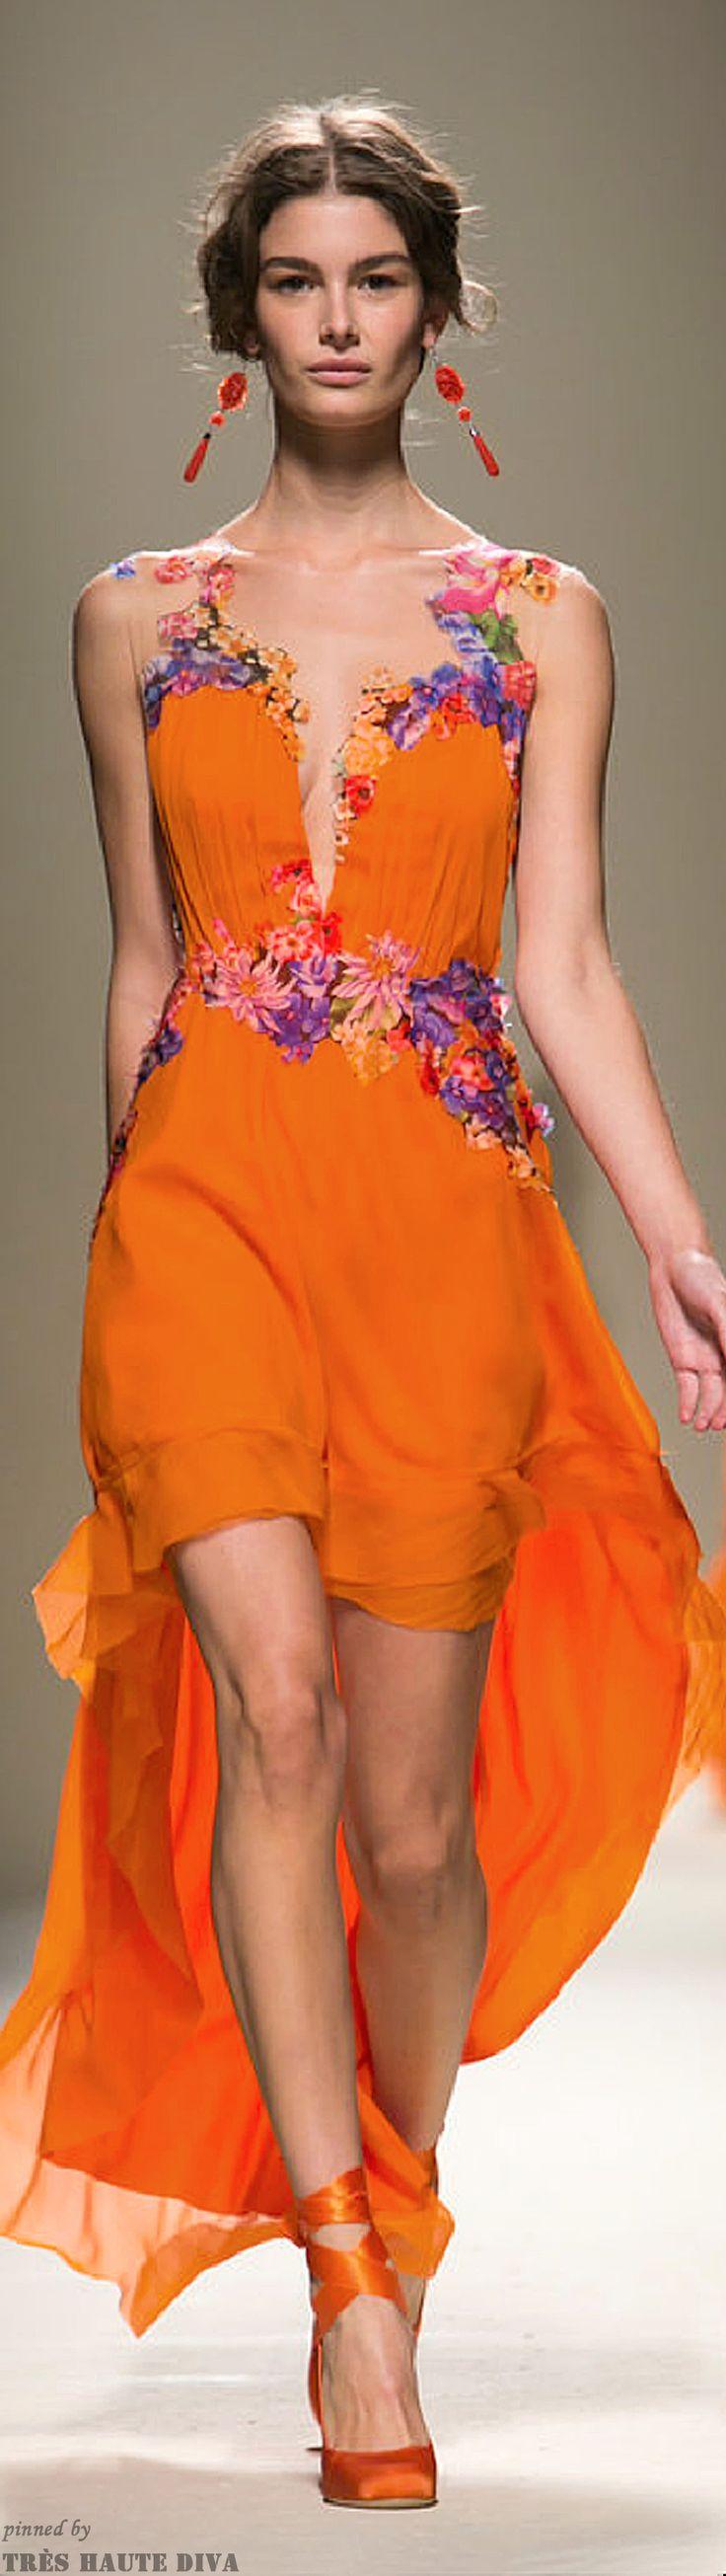 #Milan FW Alberta Ferretti Spring/Summer 2014 RTW -- Go here for your Dream Wedding Dress and Fashion Gown! https://www.etsy.com/shop/Whitesrose?ref=si_shop